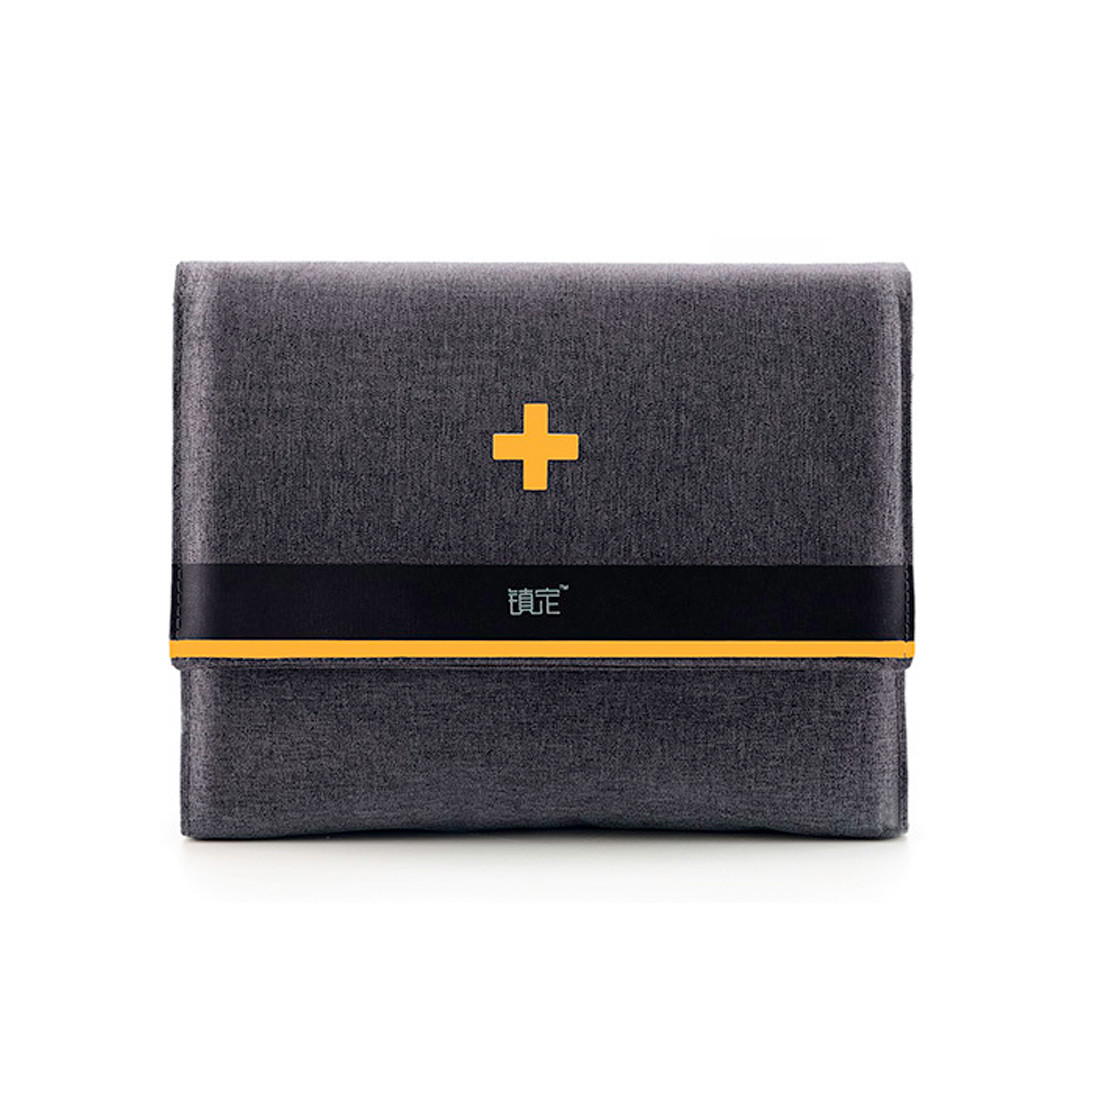 Сумка-Аптечка, Xiaomi, Zhending 6971674960027, Рюкзак 180*50*150 мм, Нейлон, Темно-серый